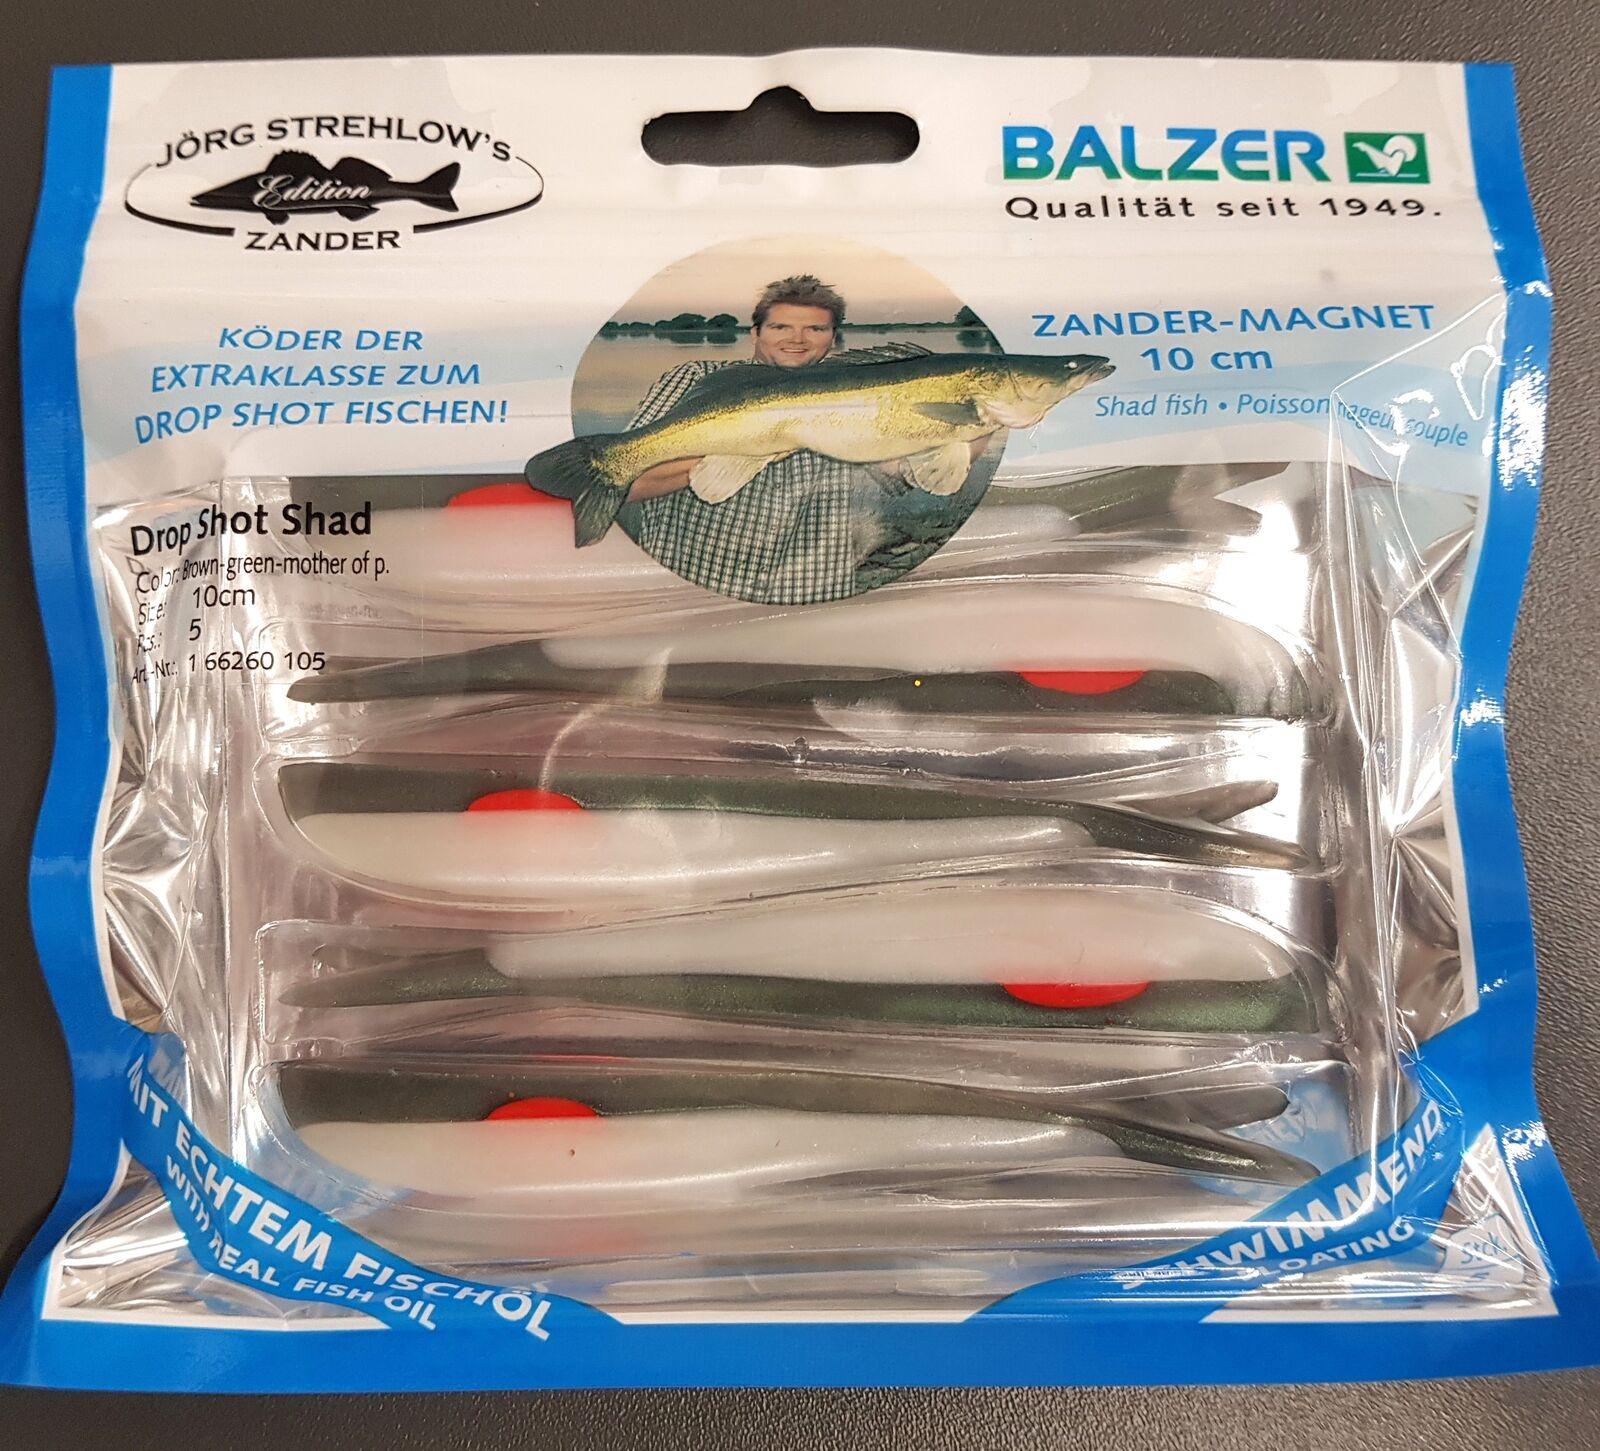 Drop Shot Shad Zander Magnet //// 10cm Balzer